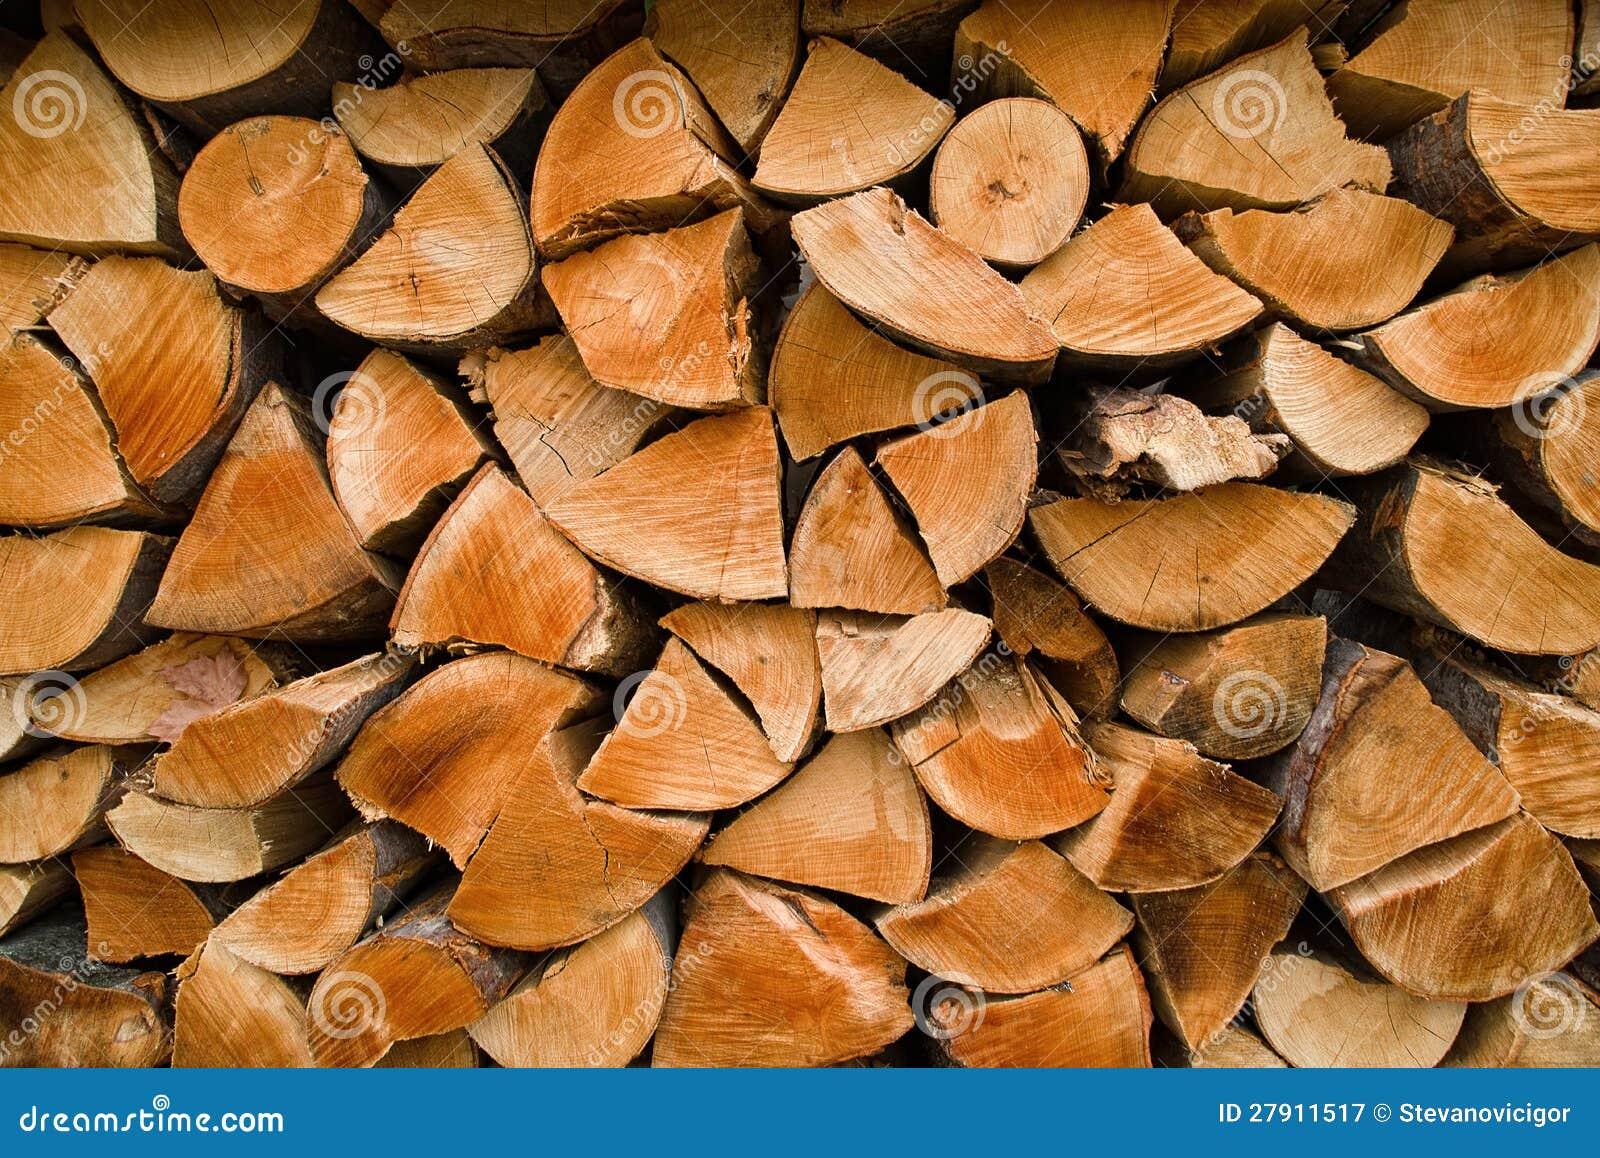 Biomass firewood royalty free stock photography image